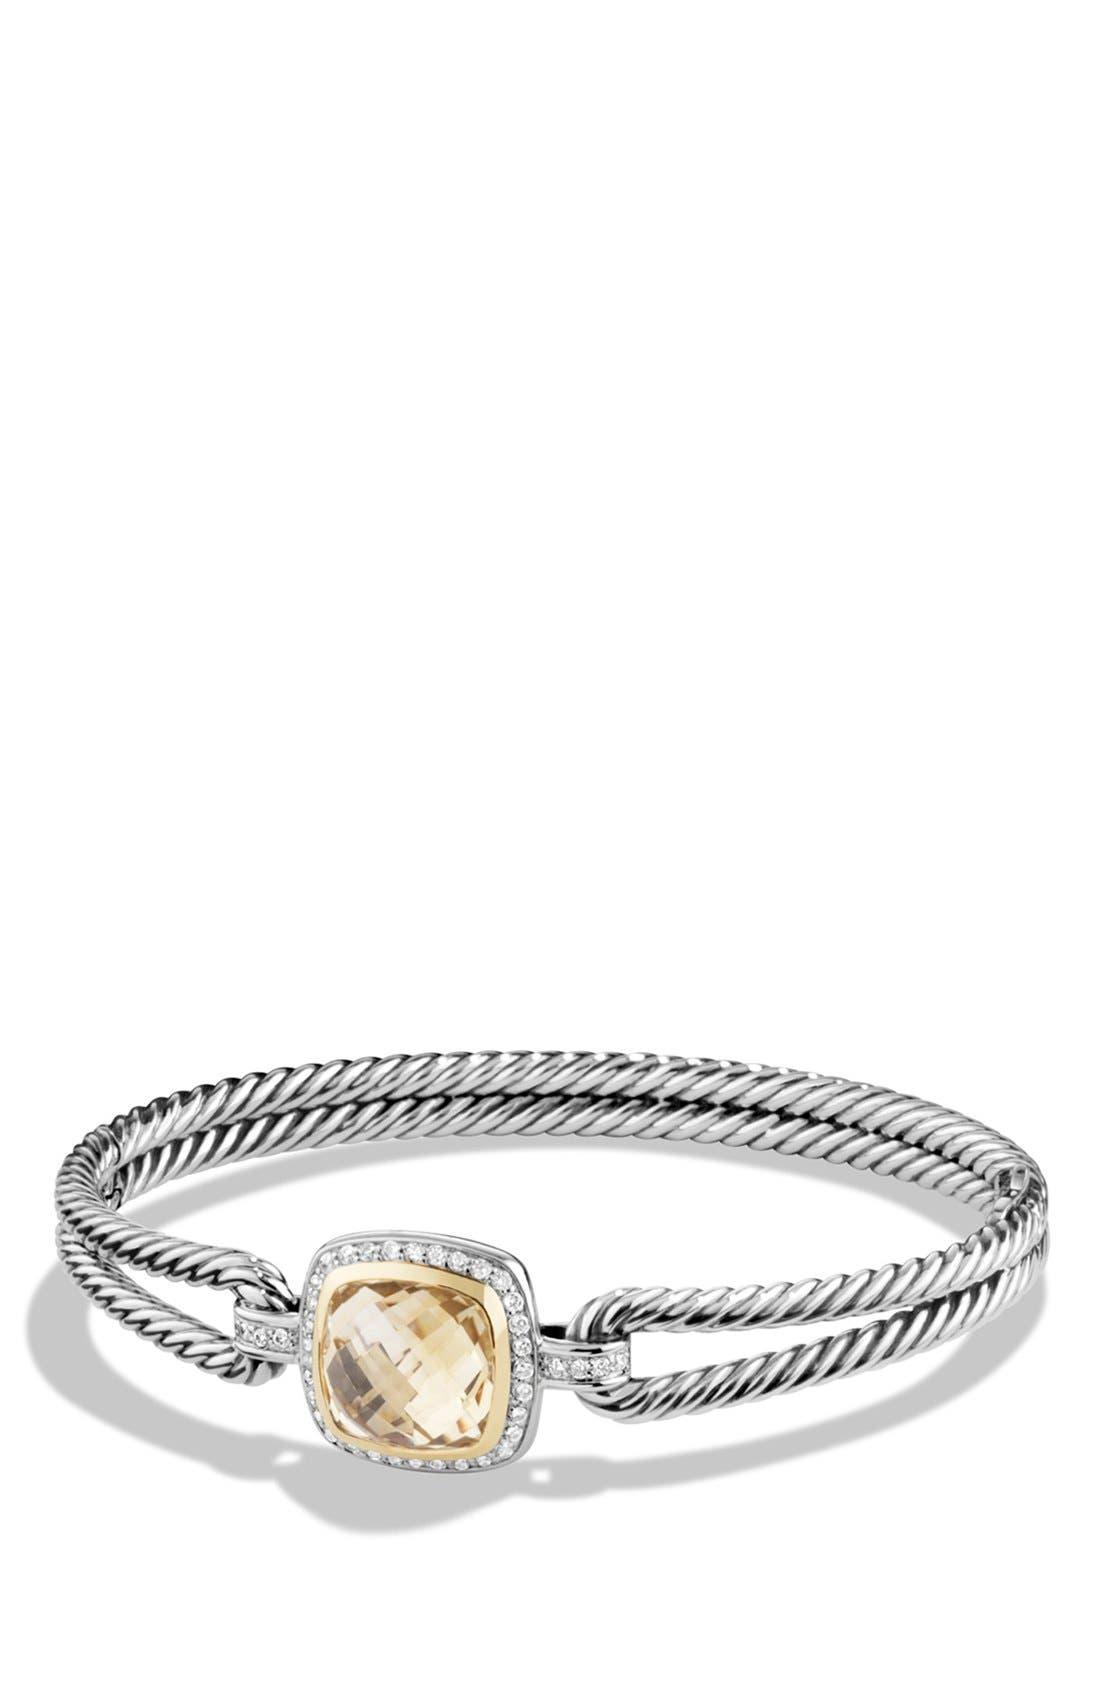 DAVID YURMAN 'Albion' Bracelet with Diamonds and 18K Gold, Main, color, CHAMPAGNE CITRINE